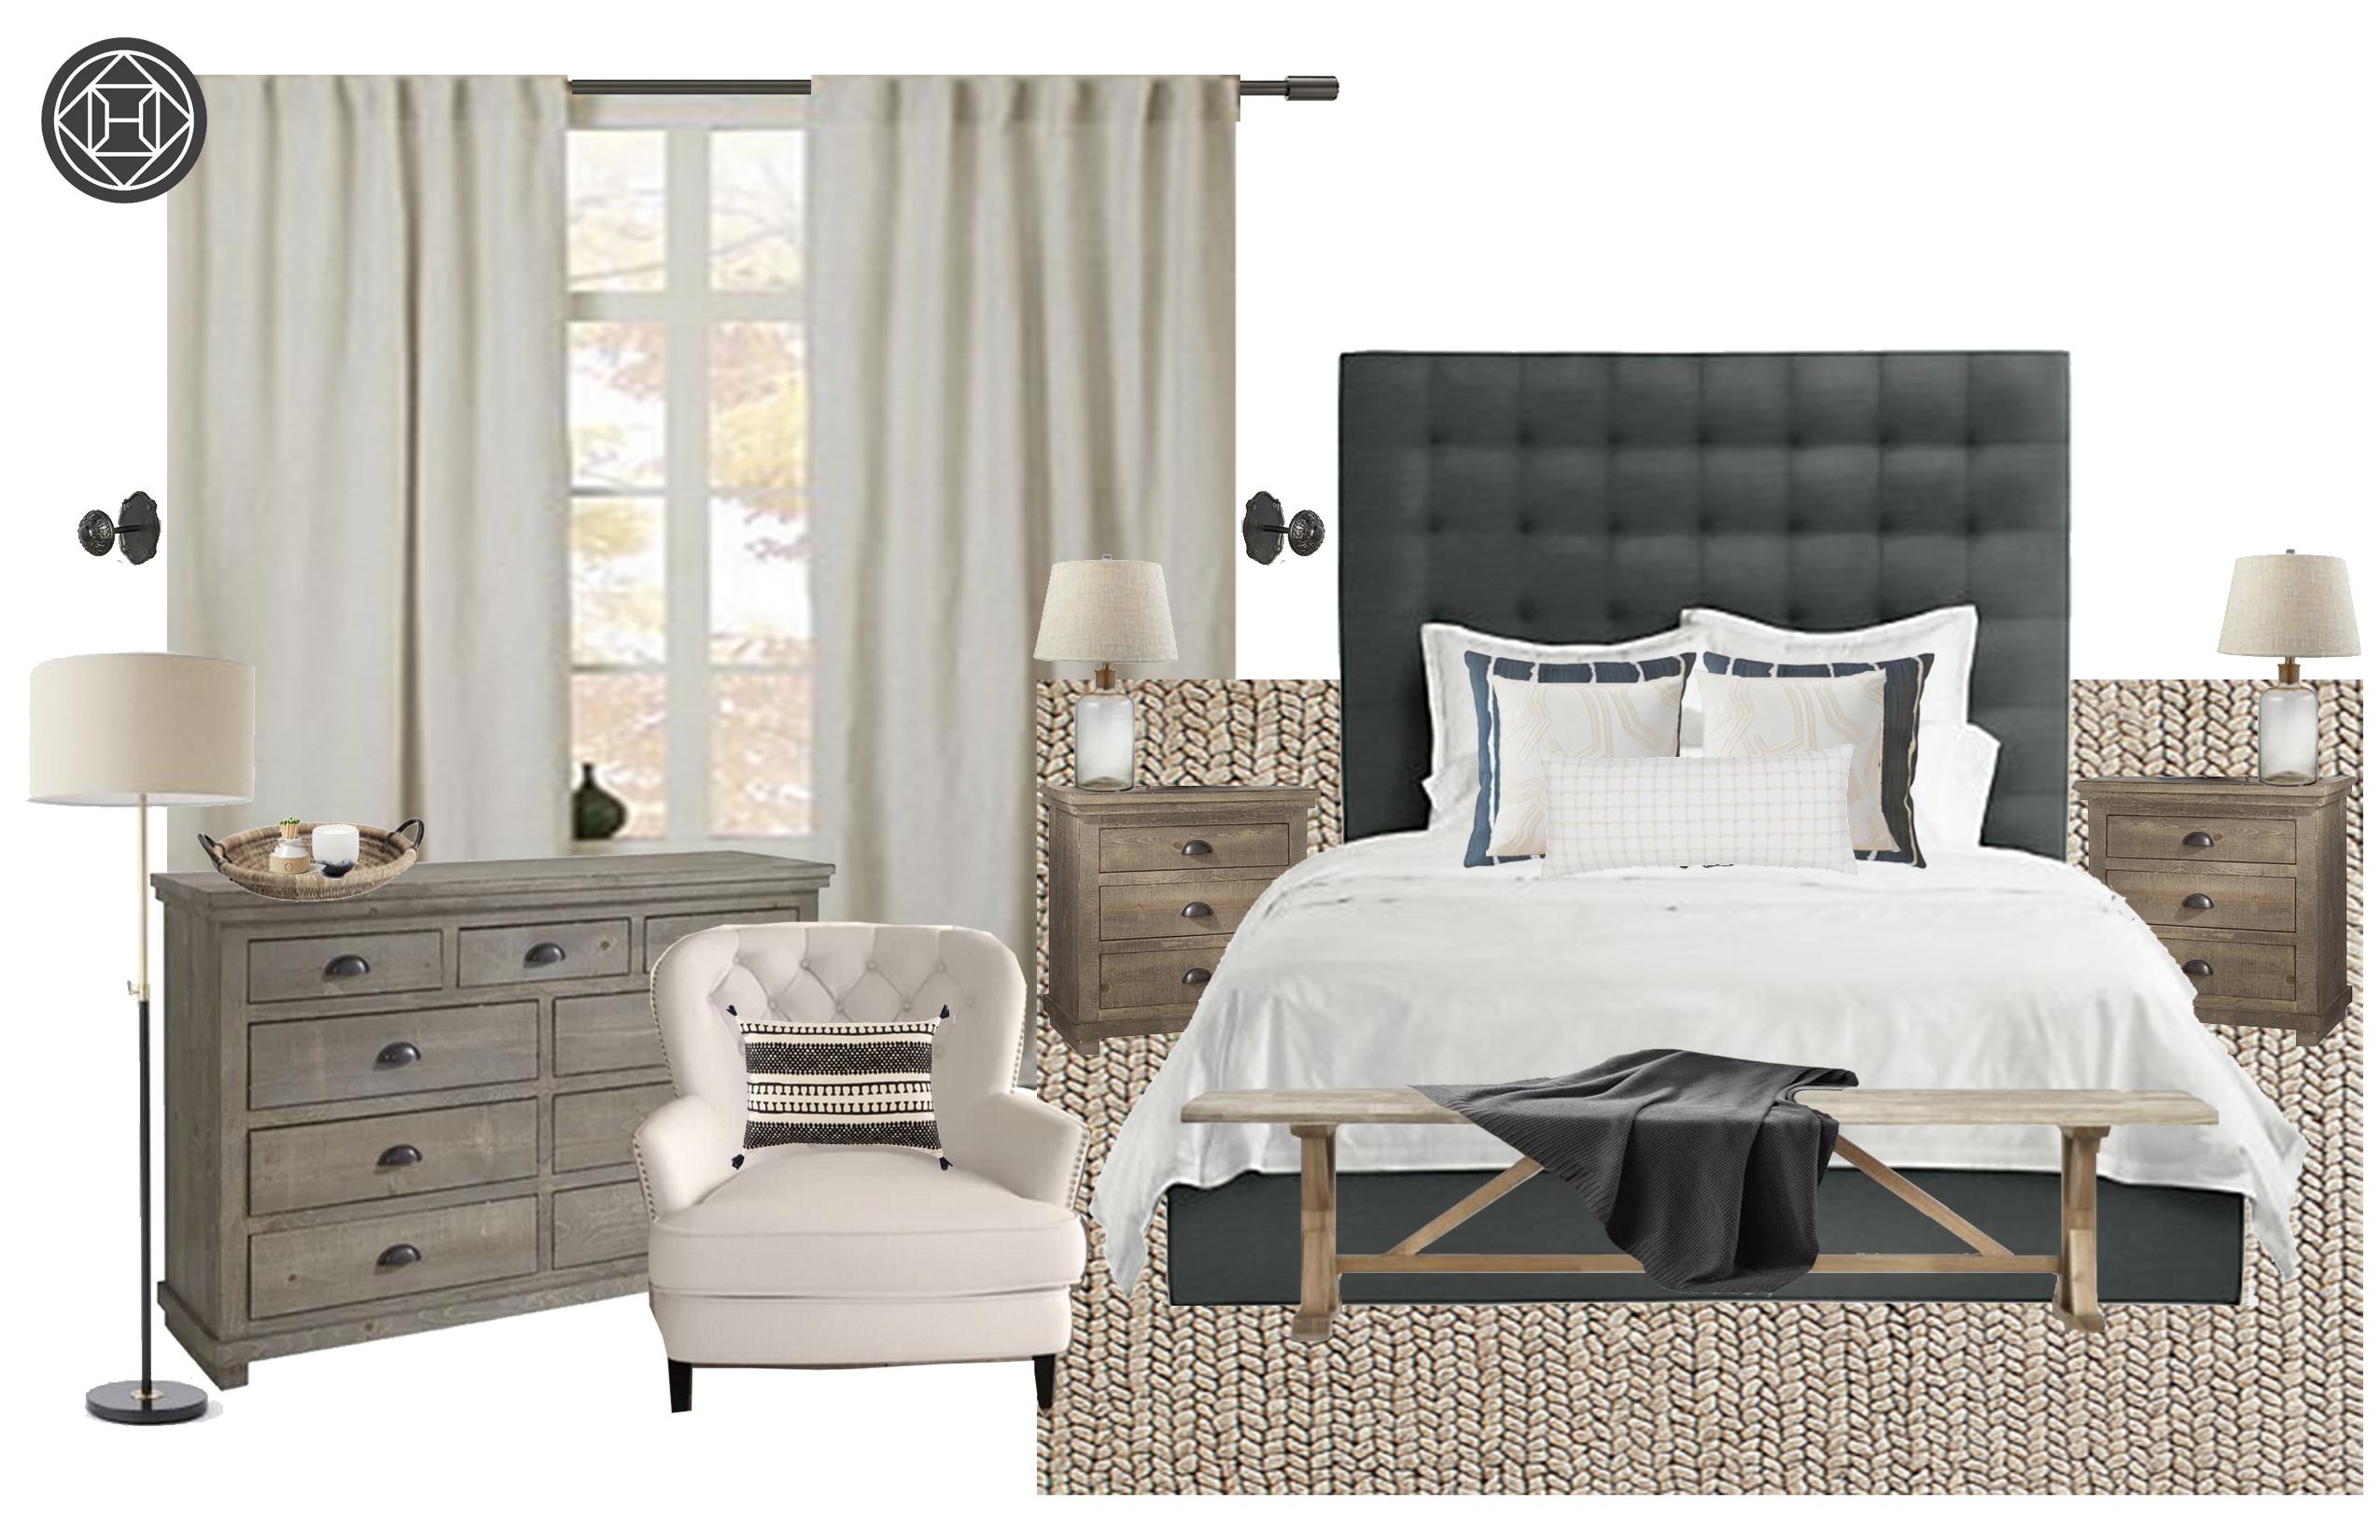 Bohemian Farmhouse Bedroom Design By Havenly Interior